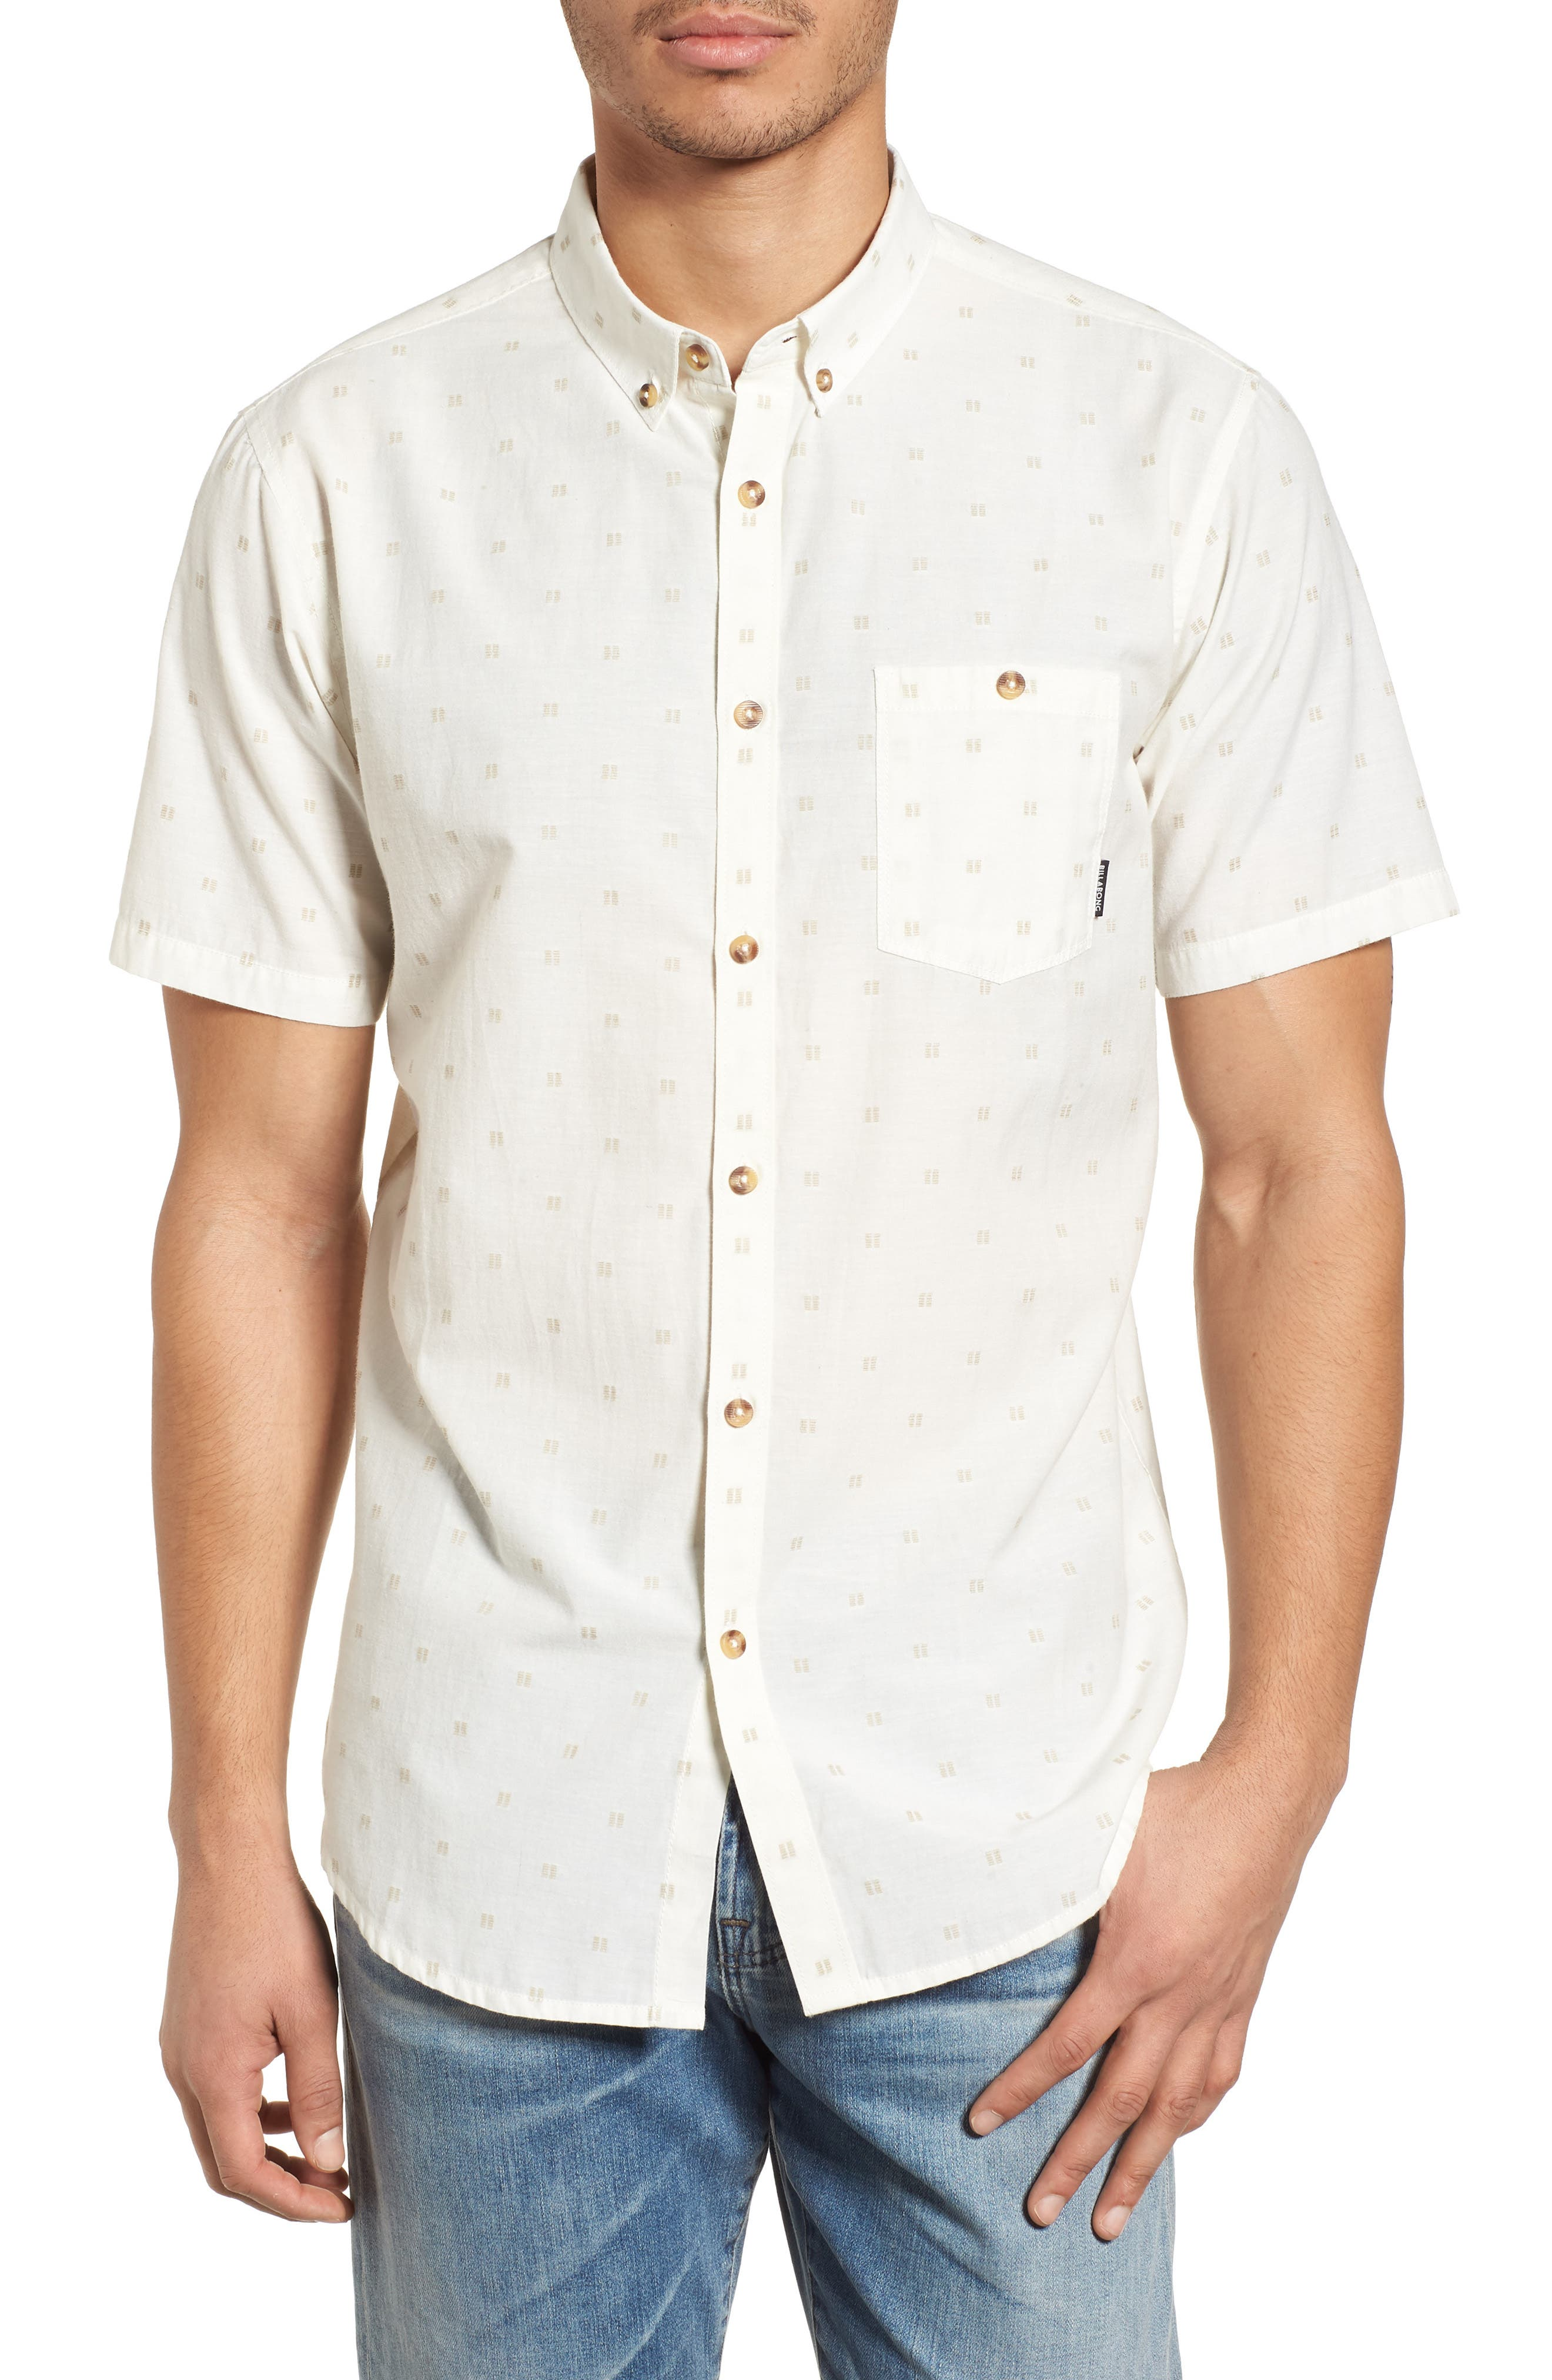 Billabong All Day Jacquard Shirt